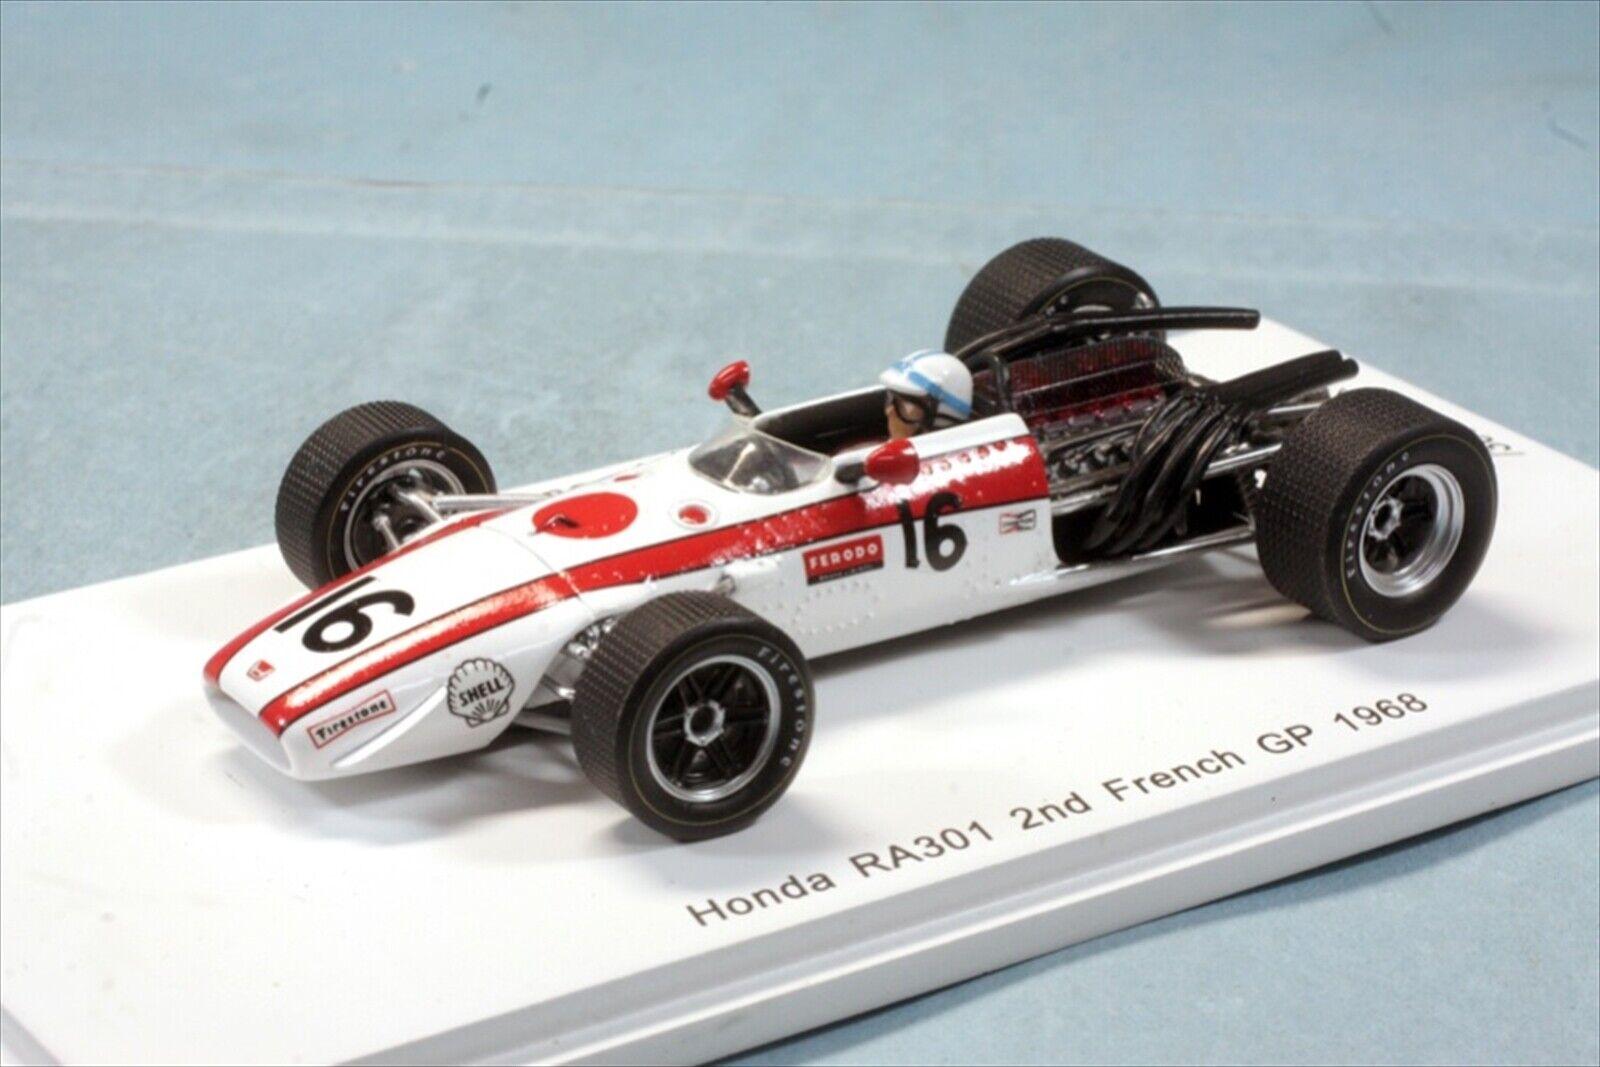 Romu SPARK 1 43 HONDA RA301 FRANCE GRAND PRIX 1968 2nd John Sartes limited 300 unités NEUF